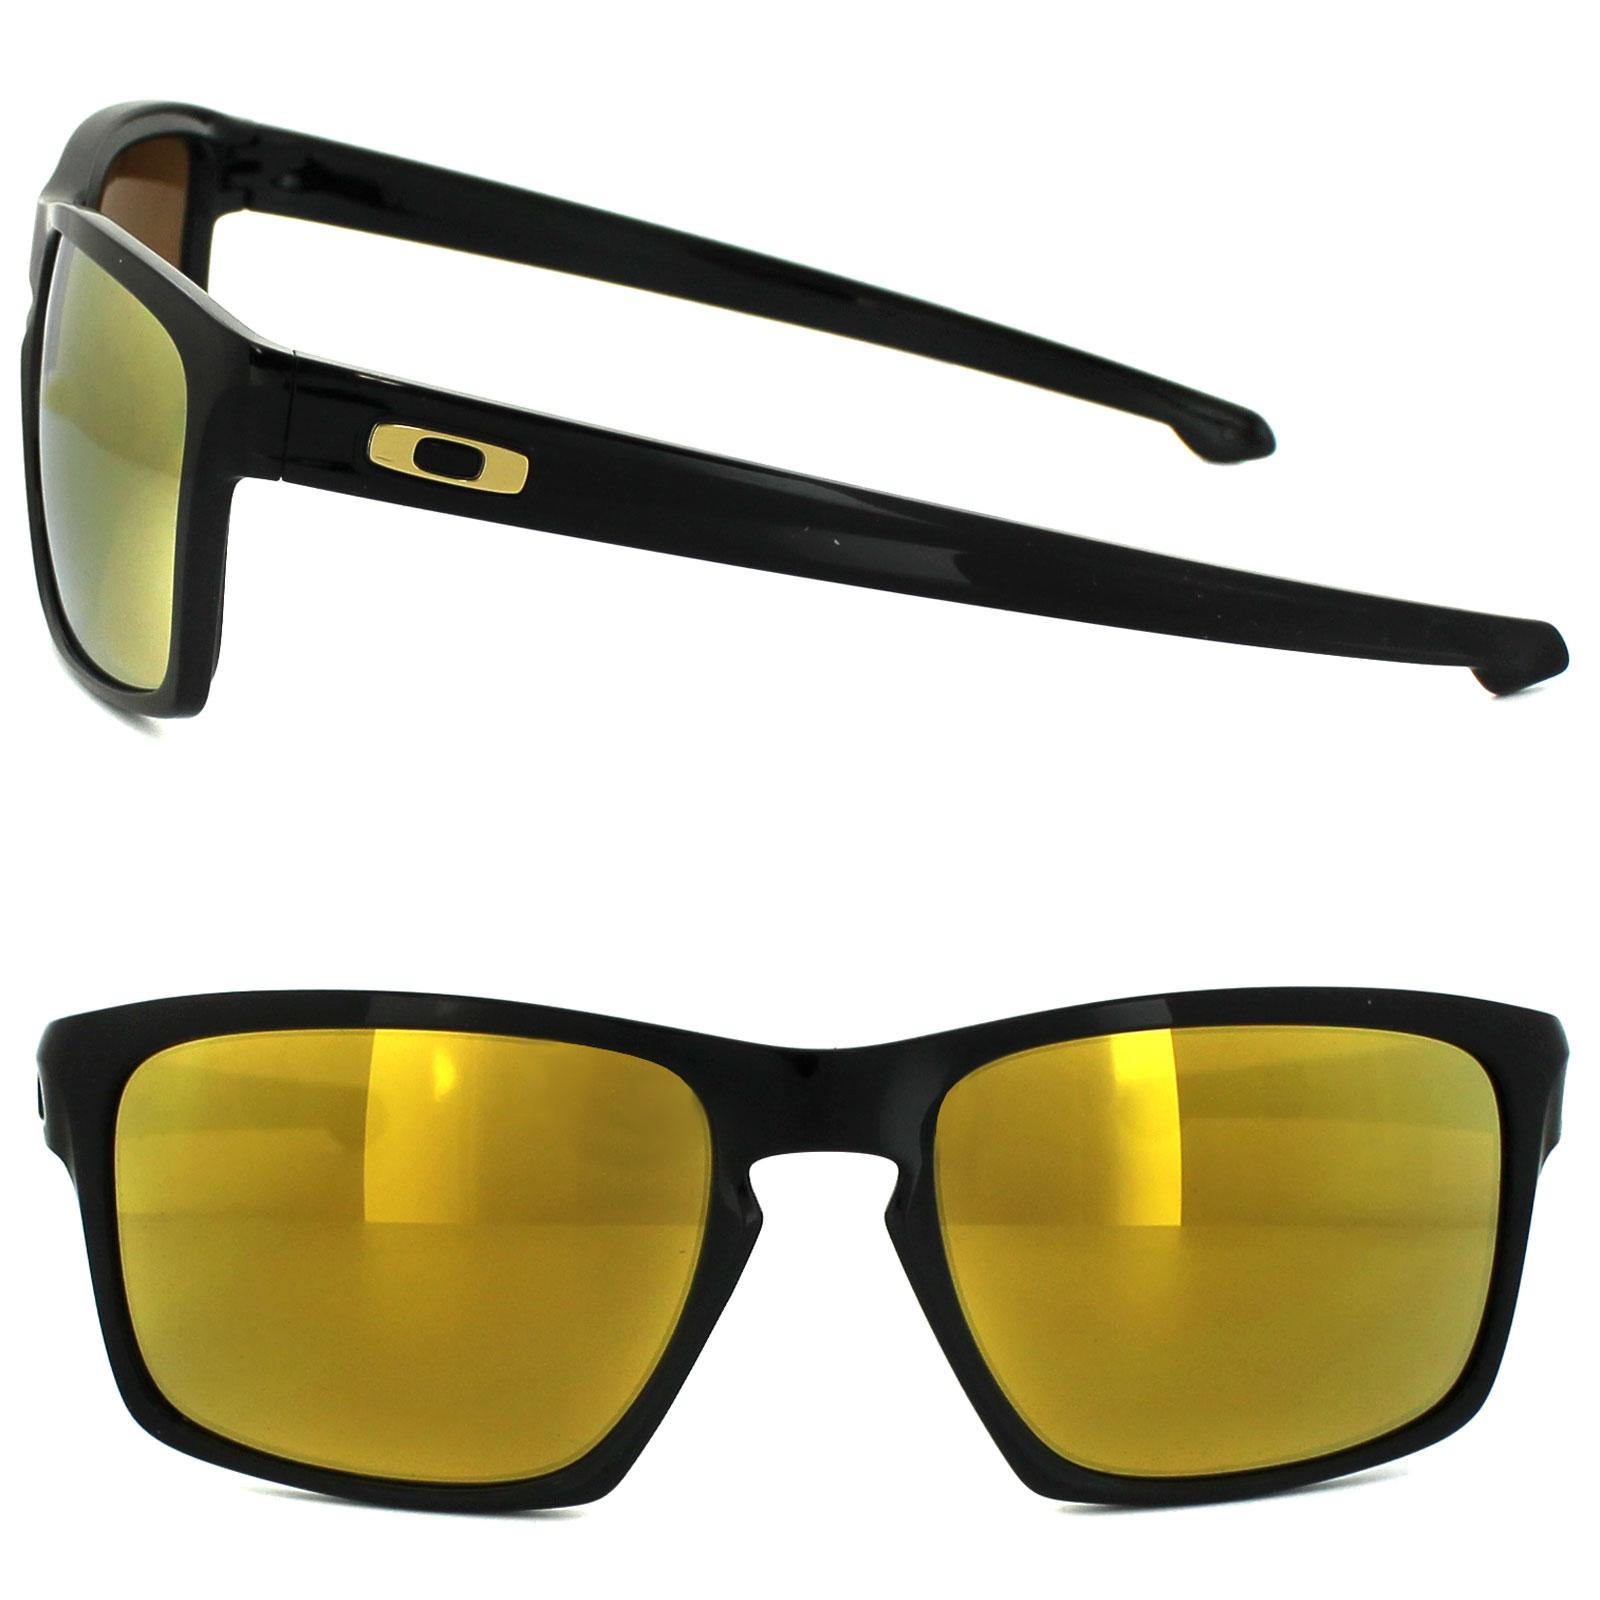 210c2d5112c49 Sentinel Oakley Sunglasses Sliver OO9262-05 Polished Black 24K Iridium